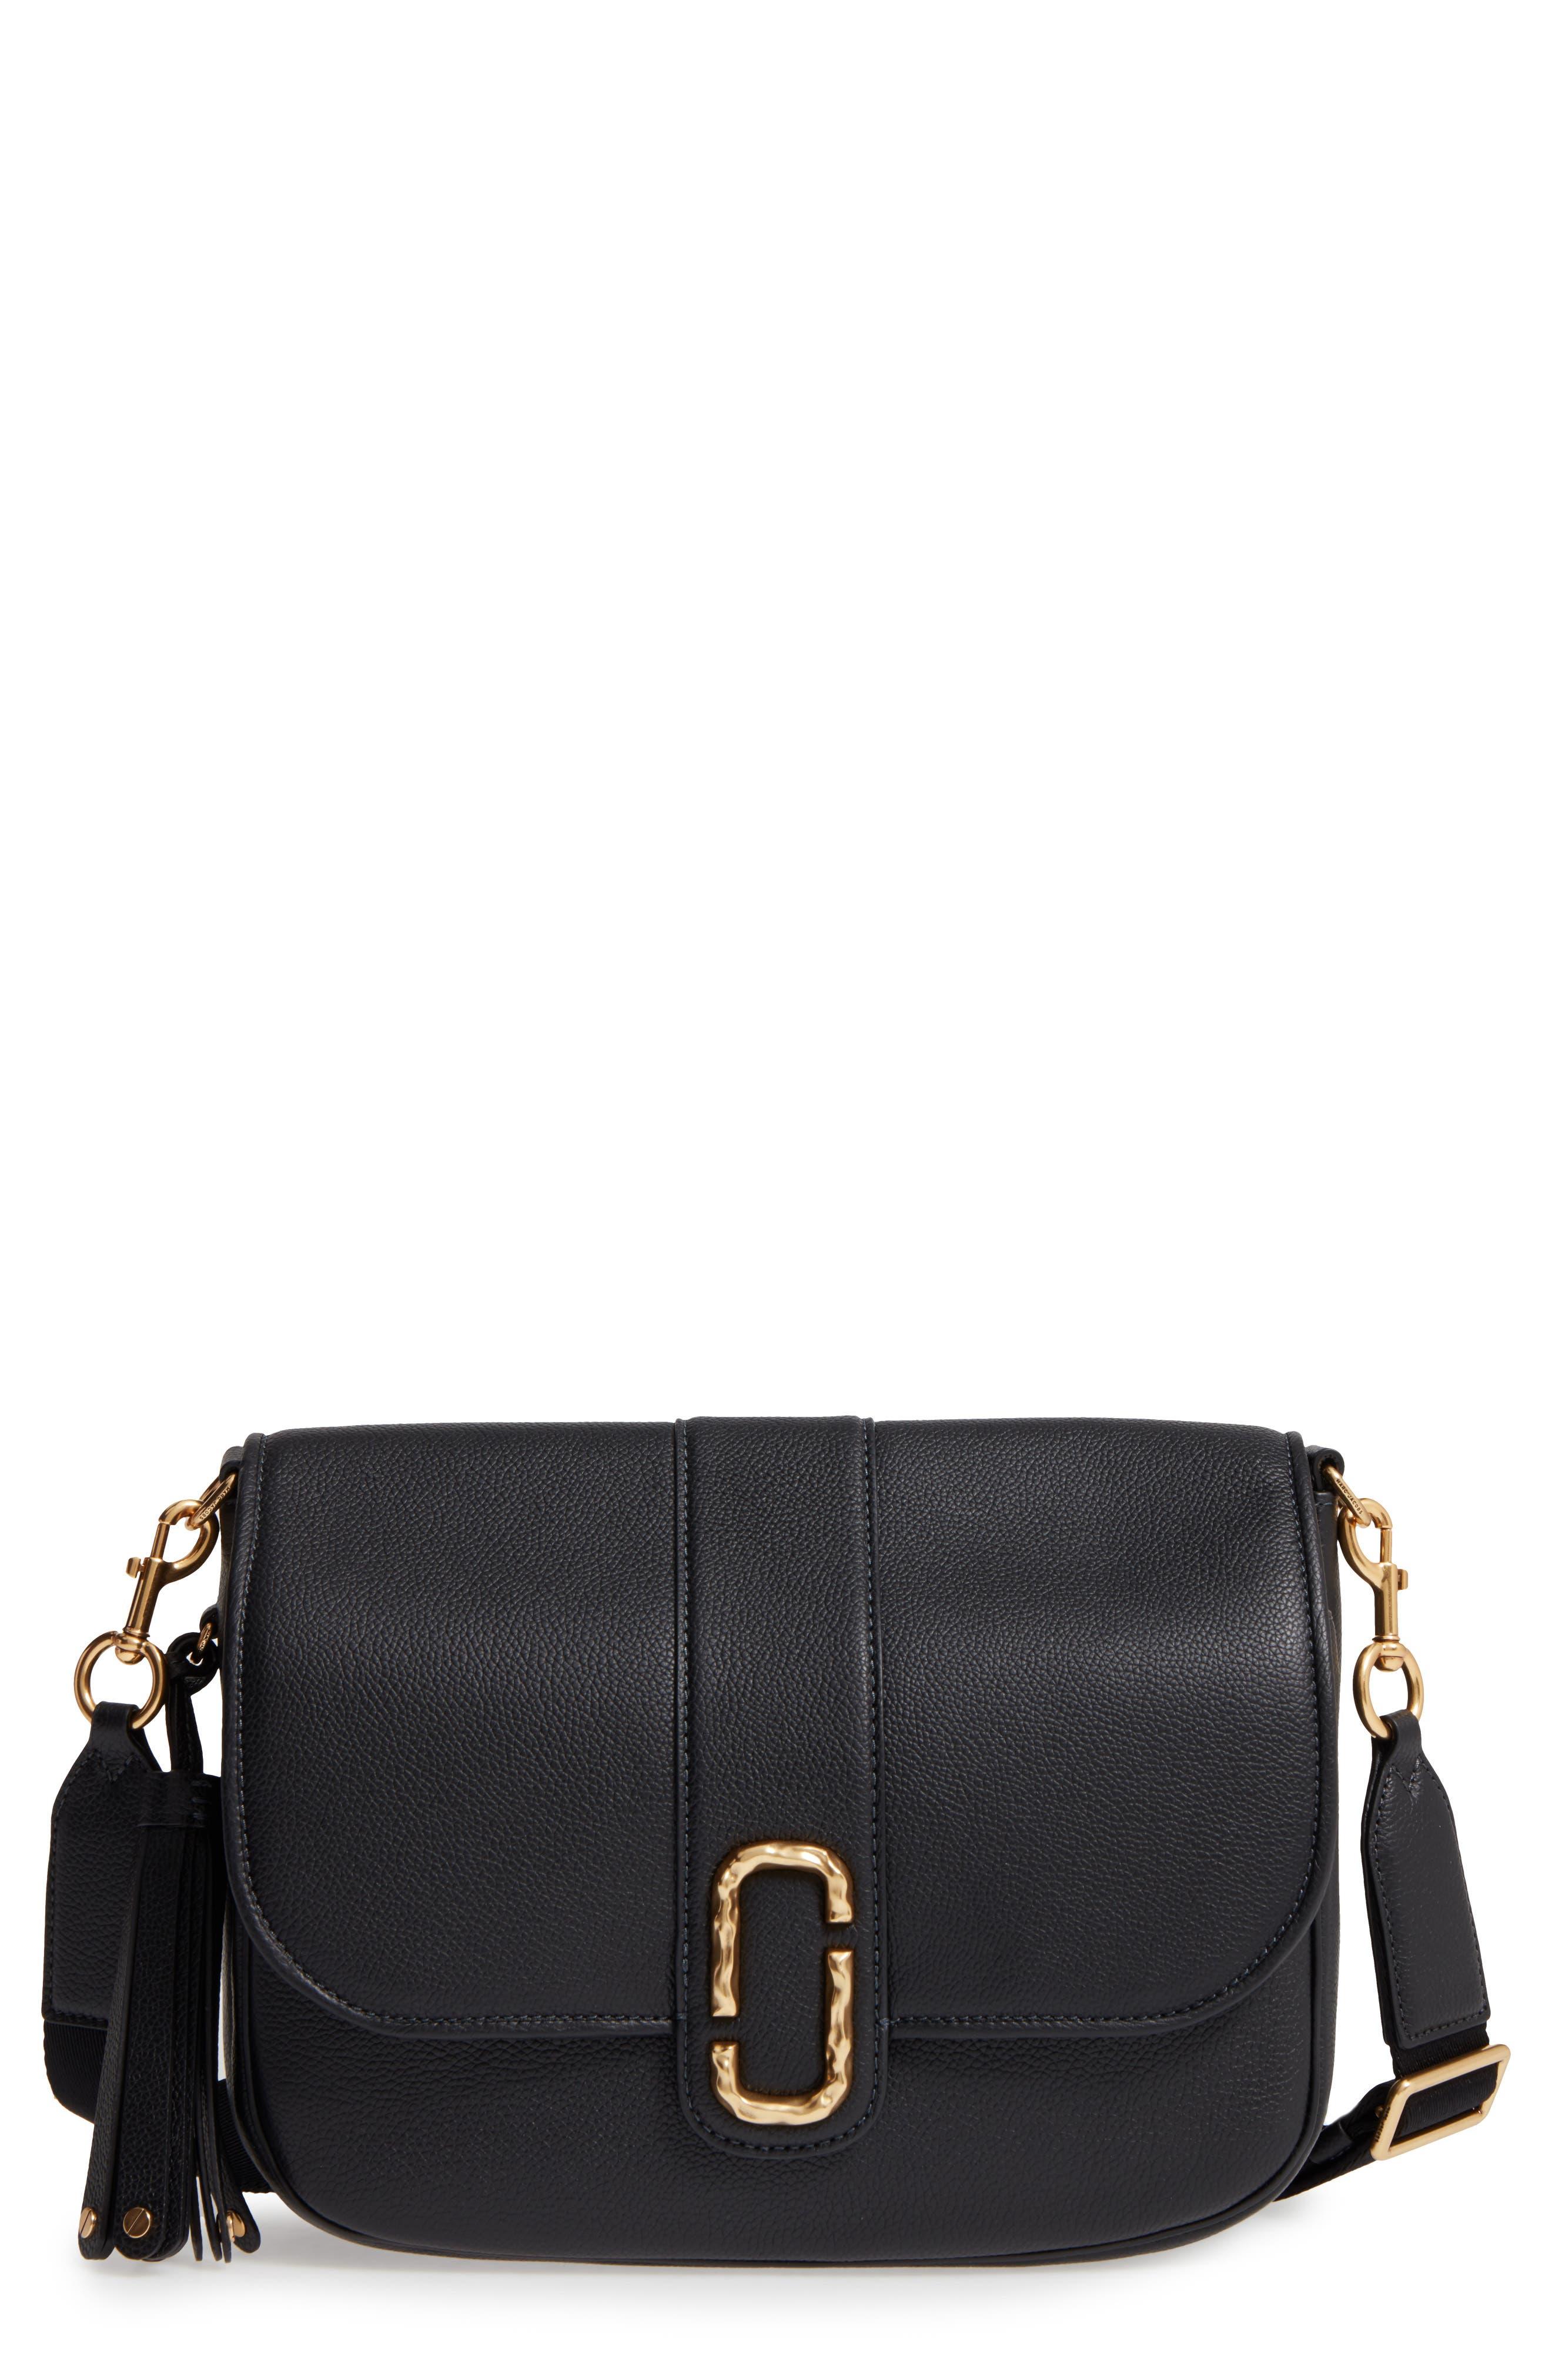 Interlock Leather Crossbody Bag,                             Main thumbnail 1, color,                             001